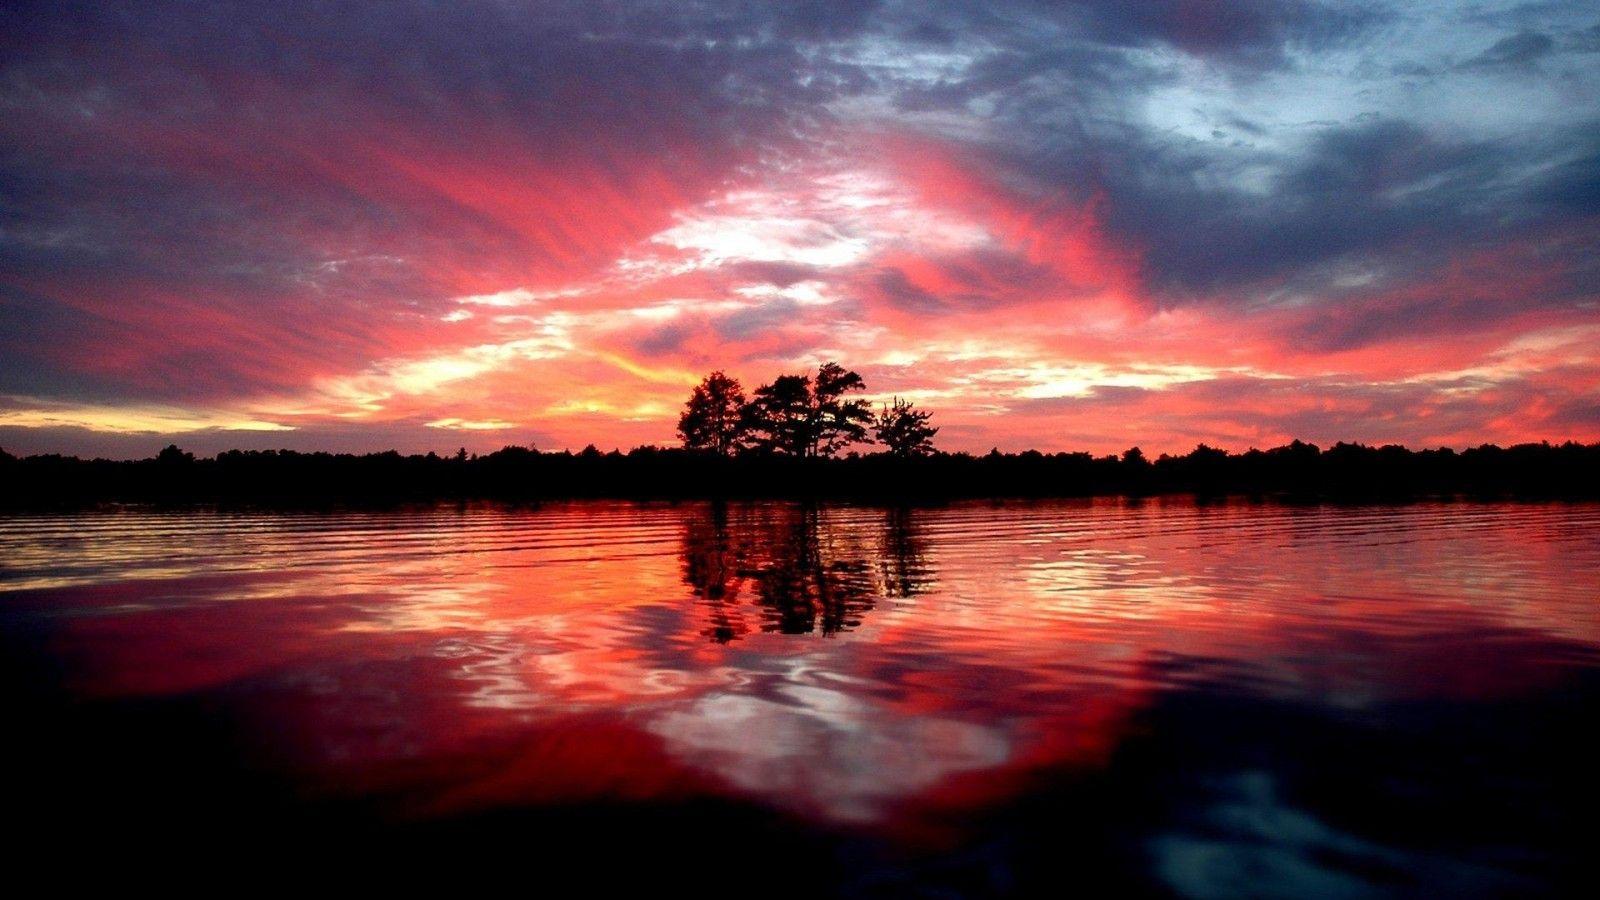 Download Wallpaper Landscape Night Sunset River Pond Beach Forest Trees Landscapes Resolution 1600x900